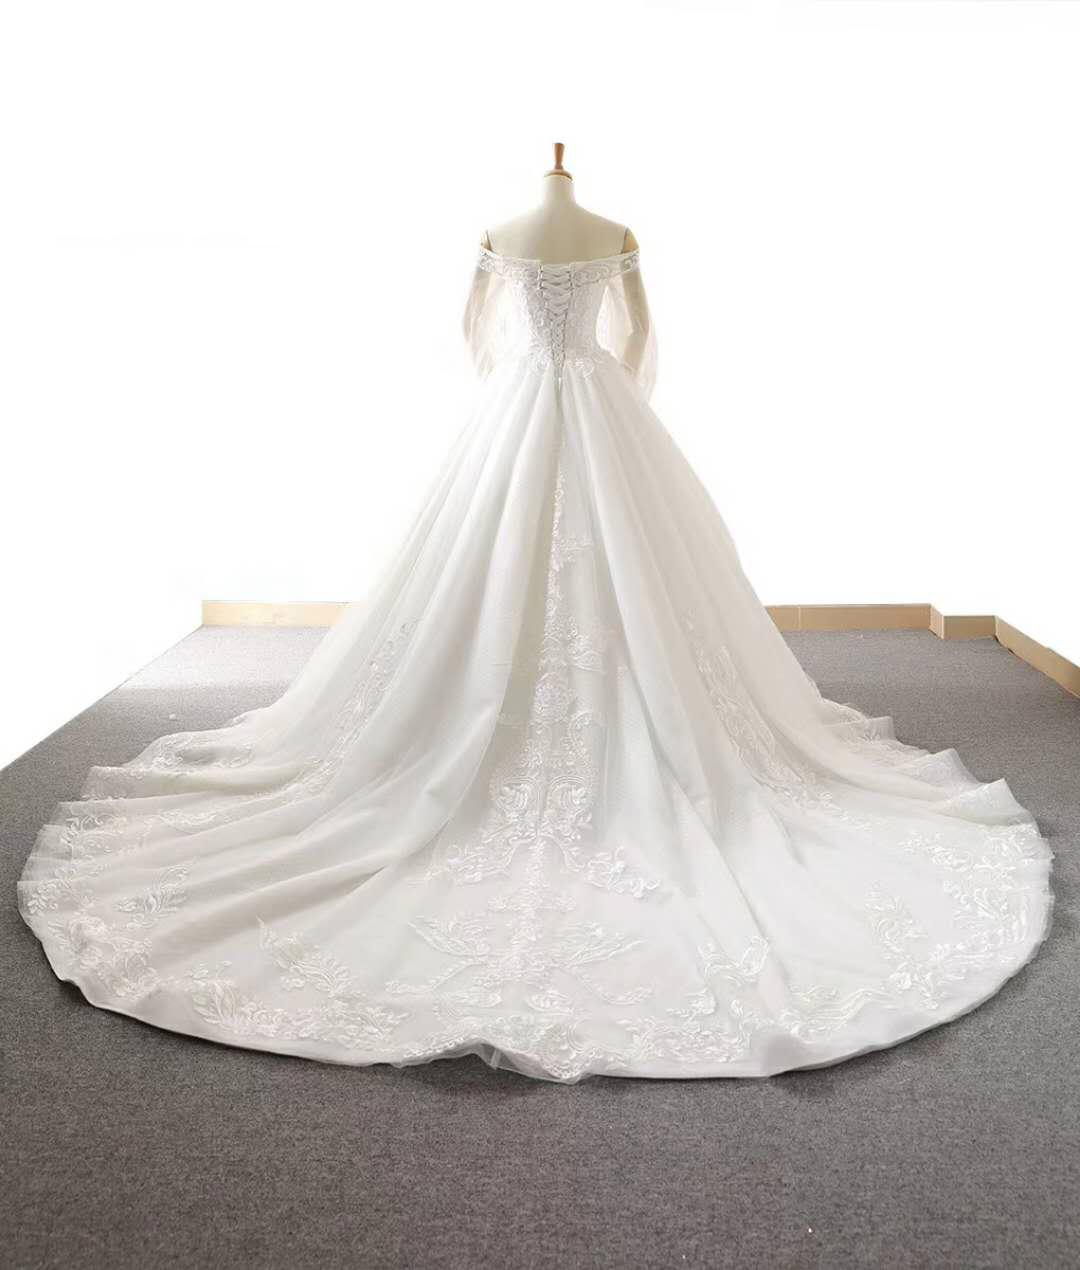 b1a75af21 RSM66612 الزفاف فستان الزفاف ثوب جديد ثوب الوهم العنق رخيصة فساتين الزفاف  الحديثة